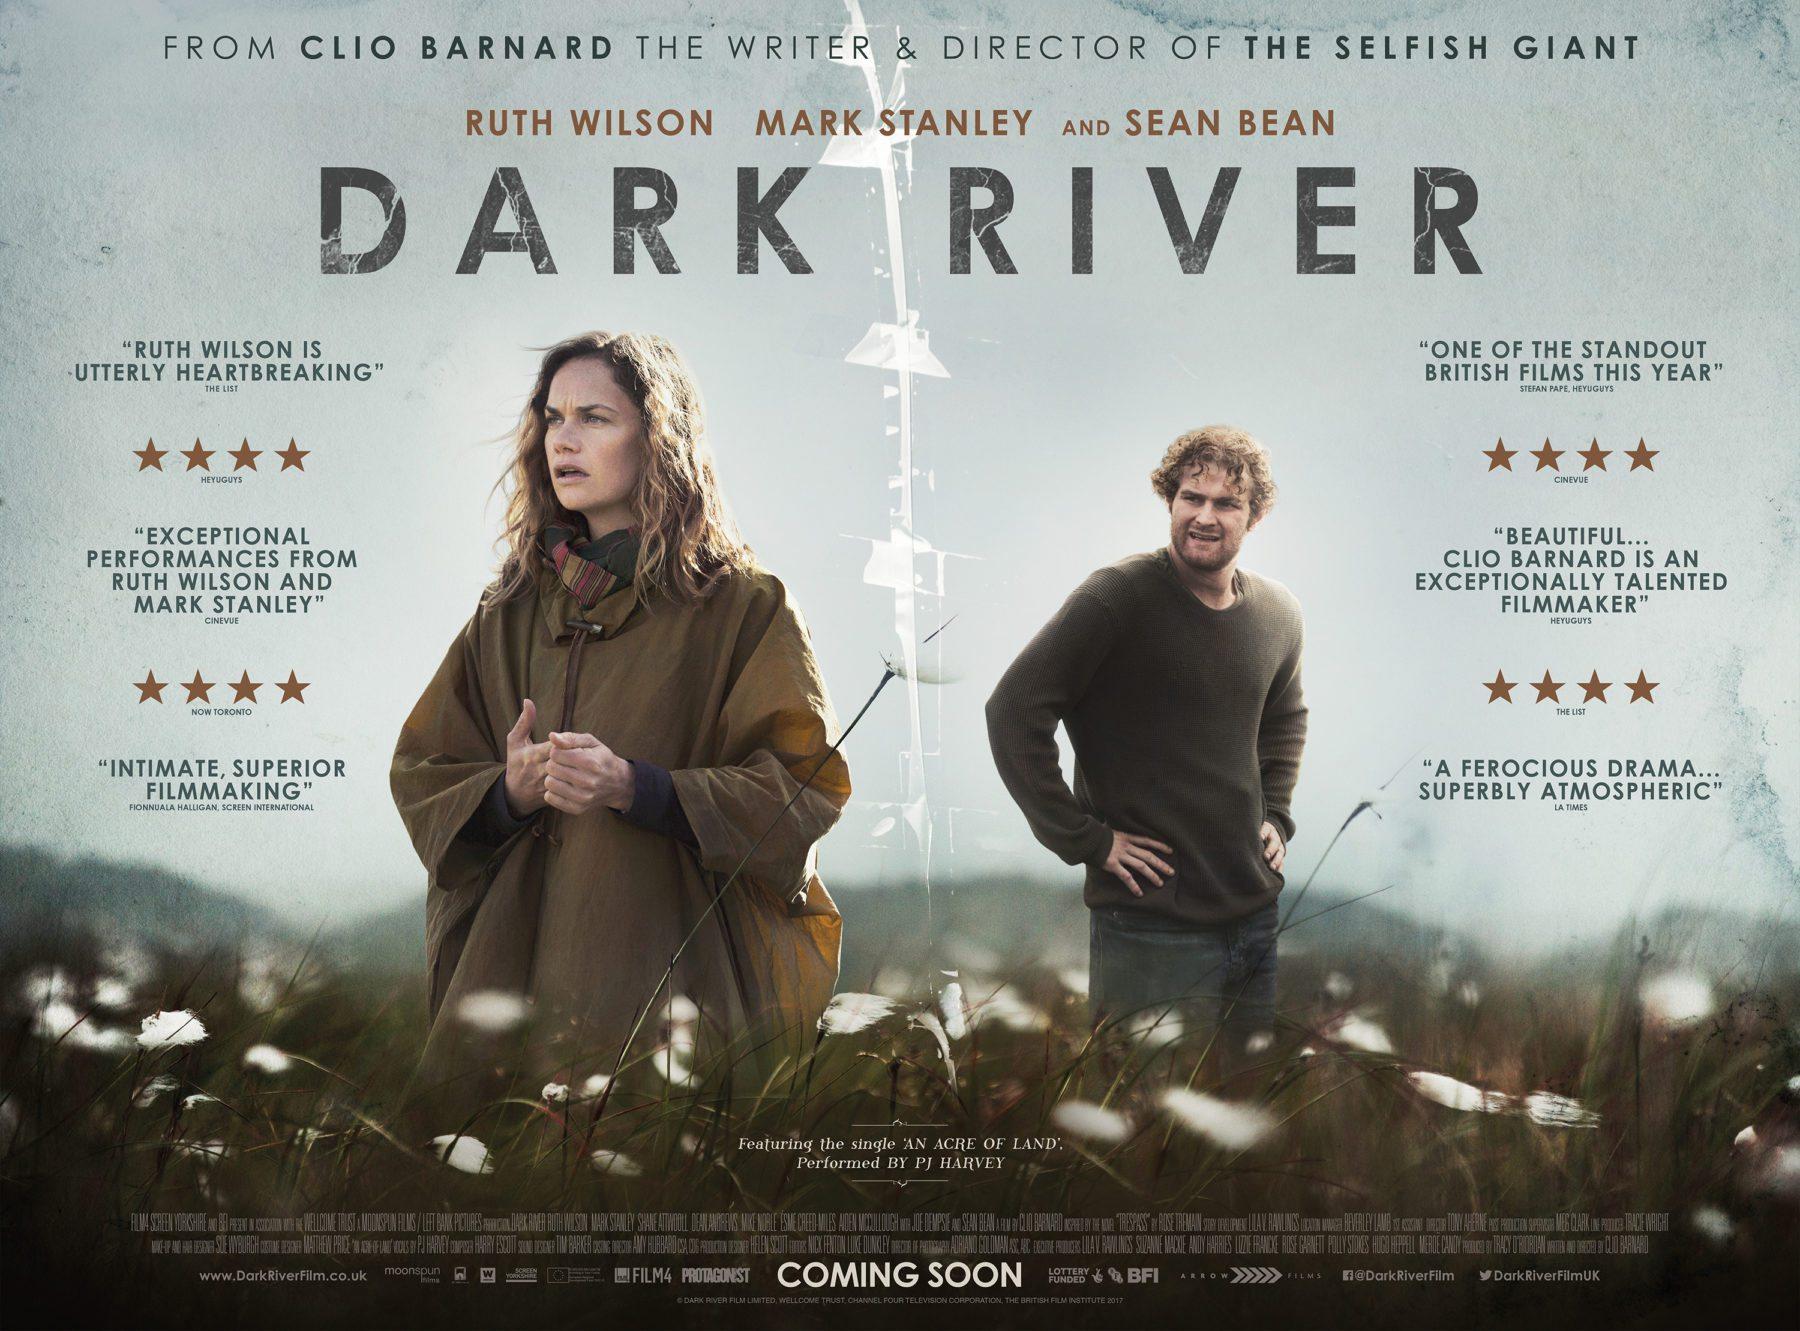 Movie Review - Dark River (2018)